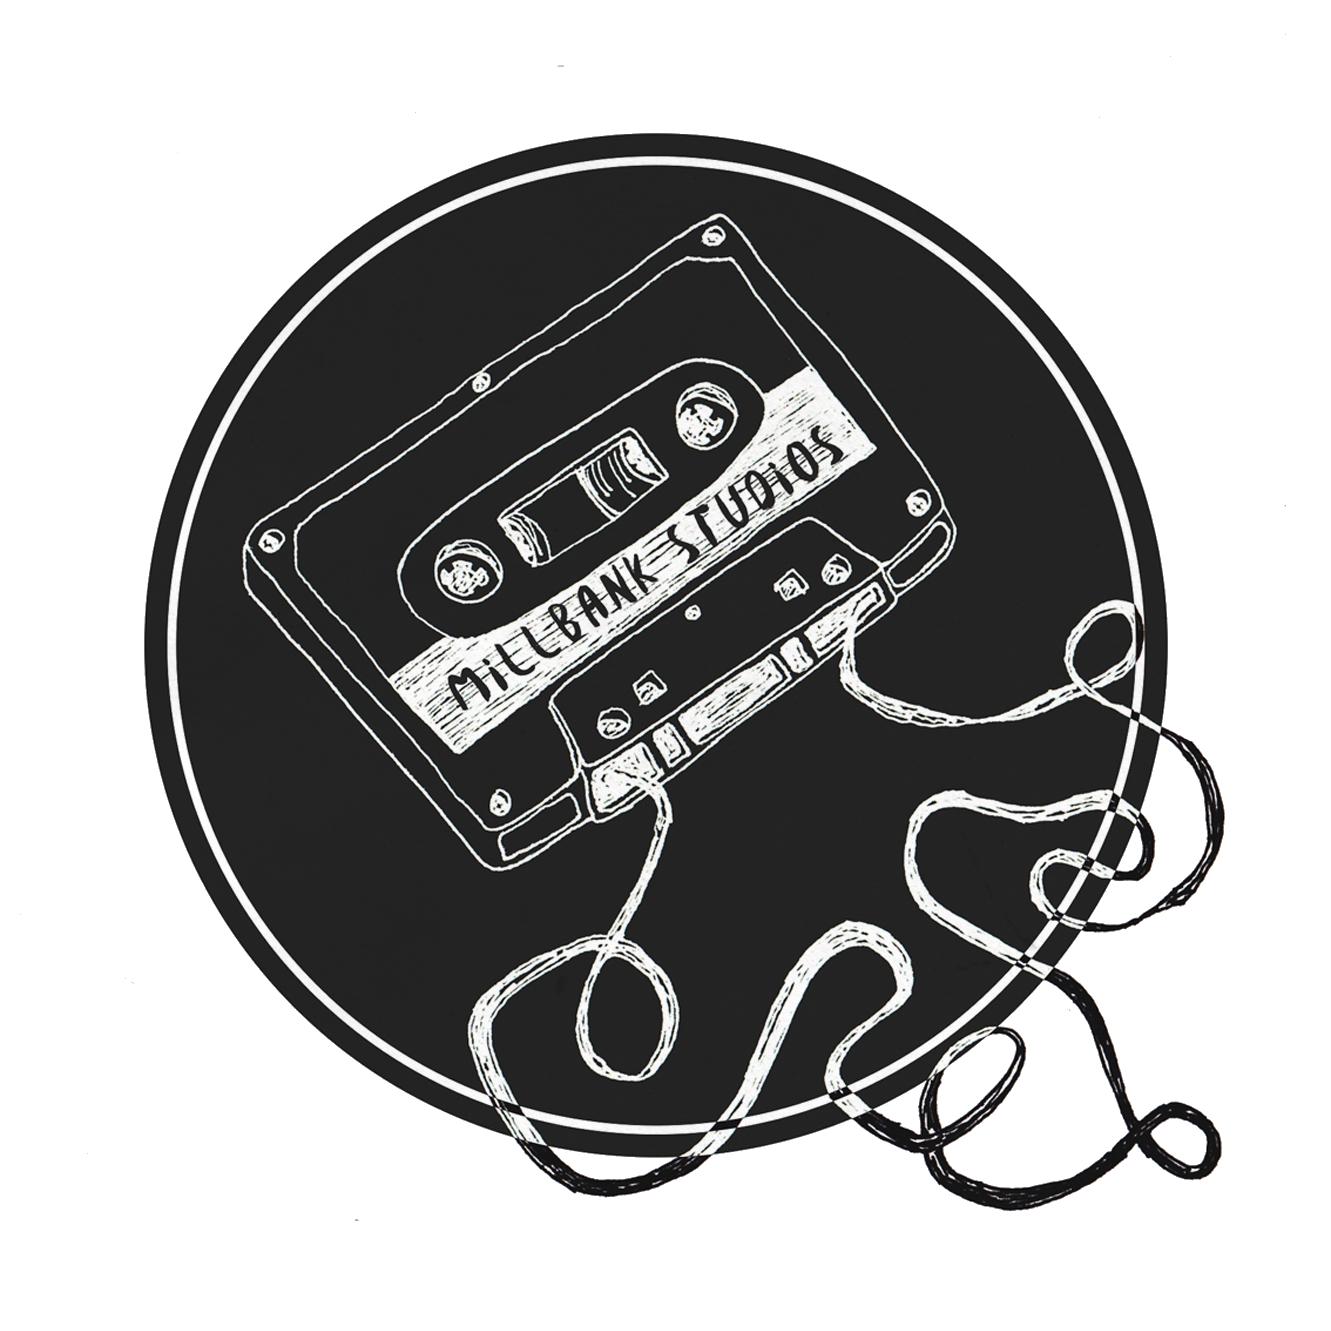 vector library download Millbank studios recording mixing. Drawing hub nord studio